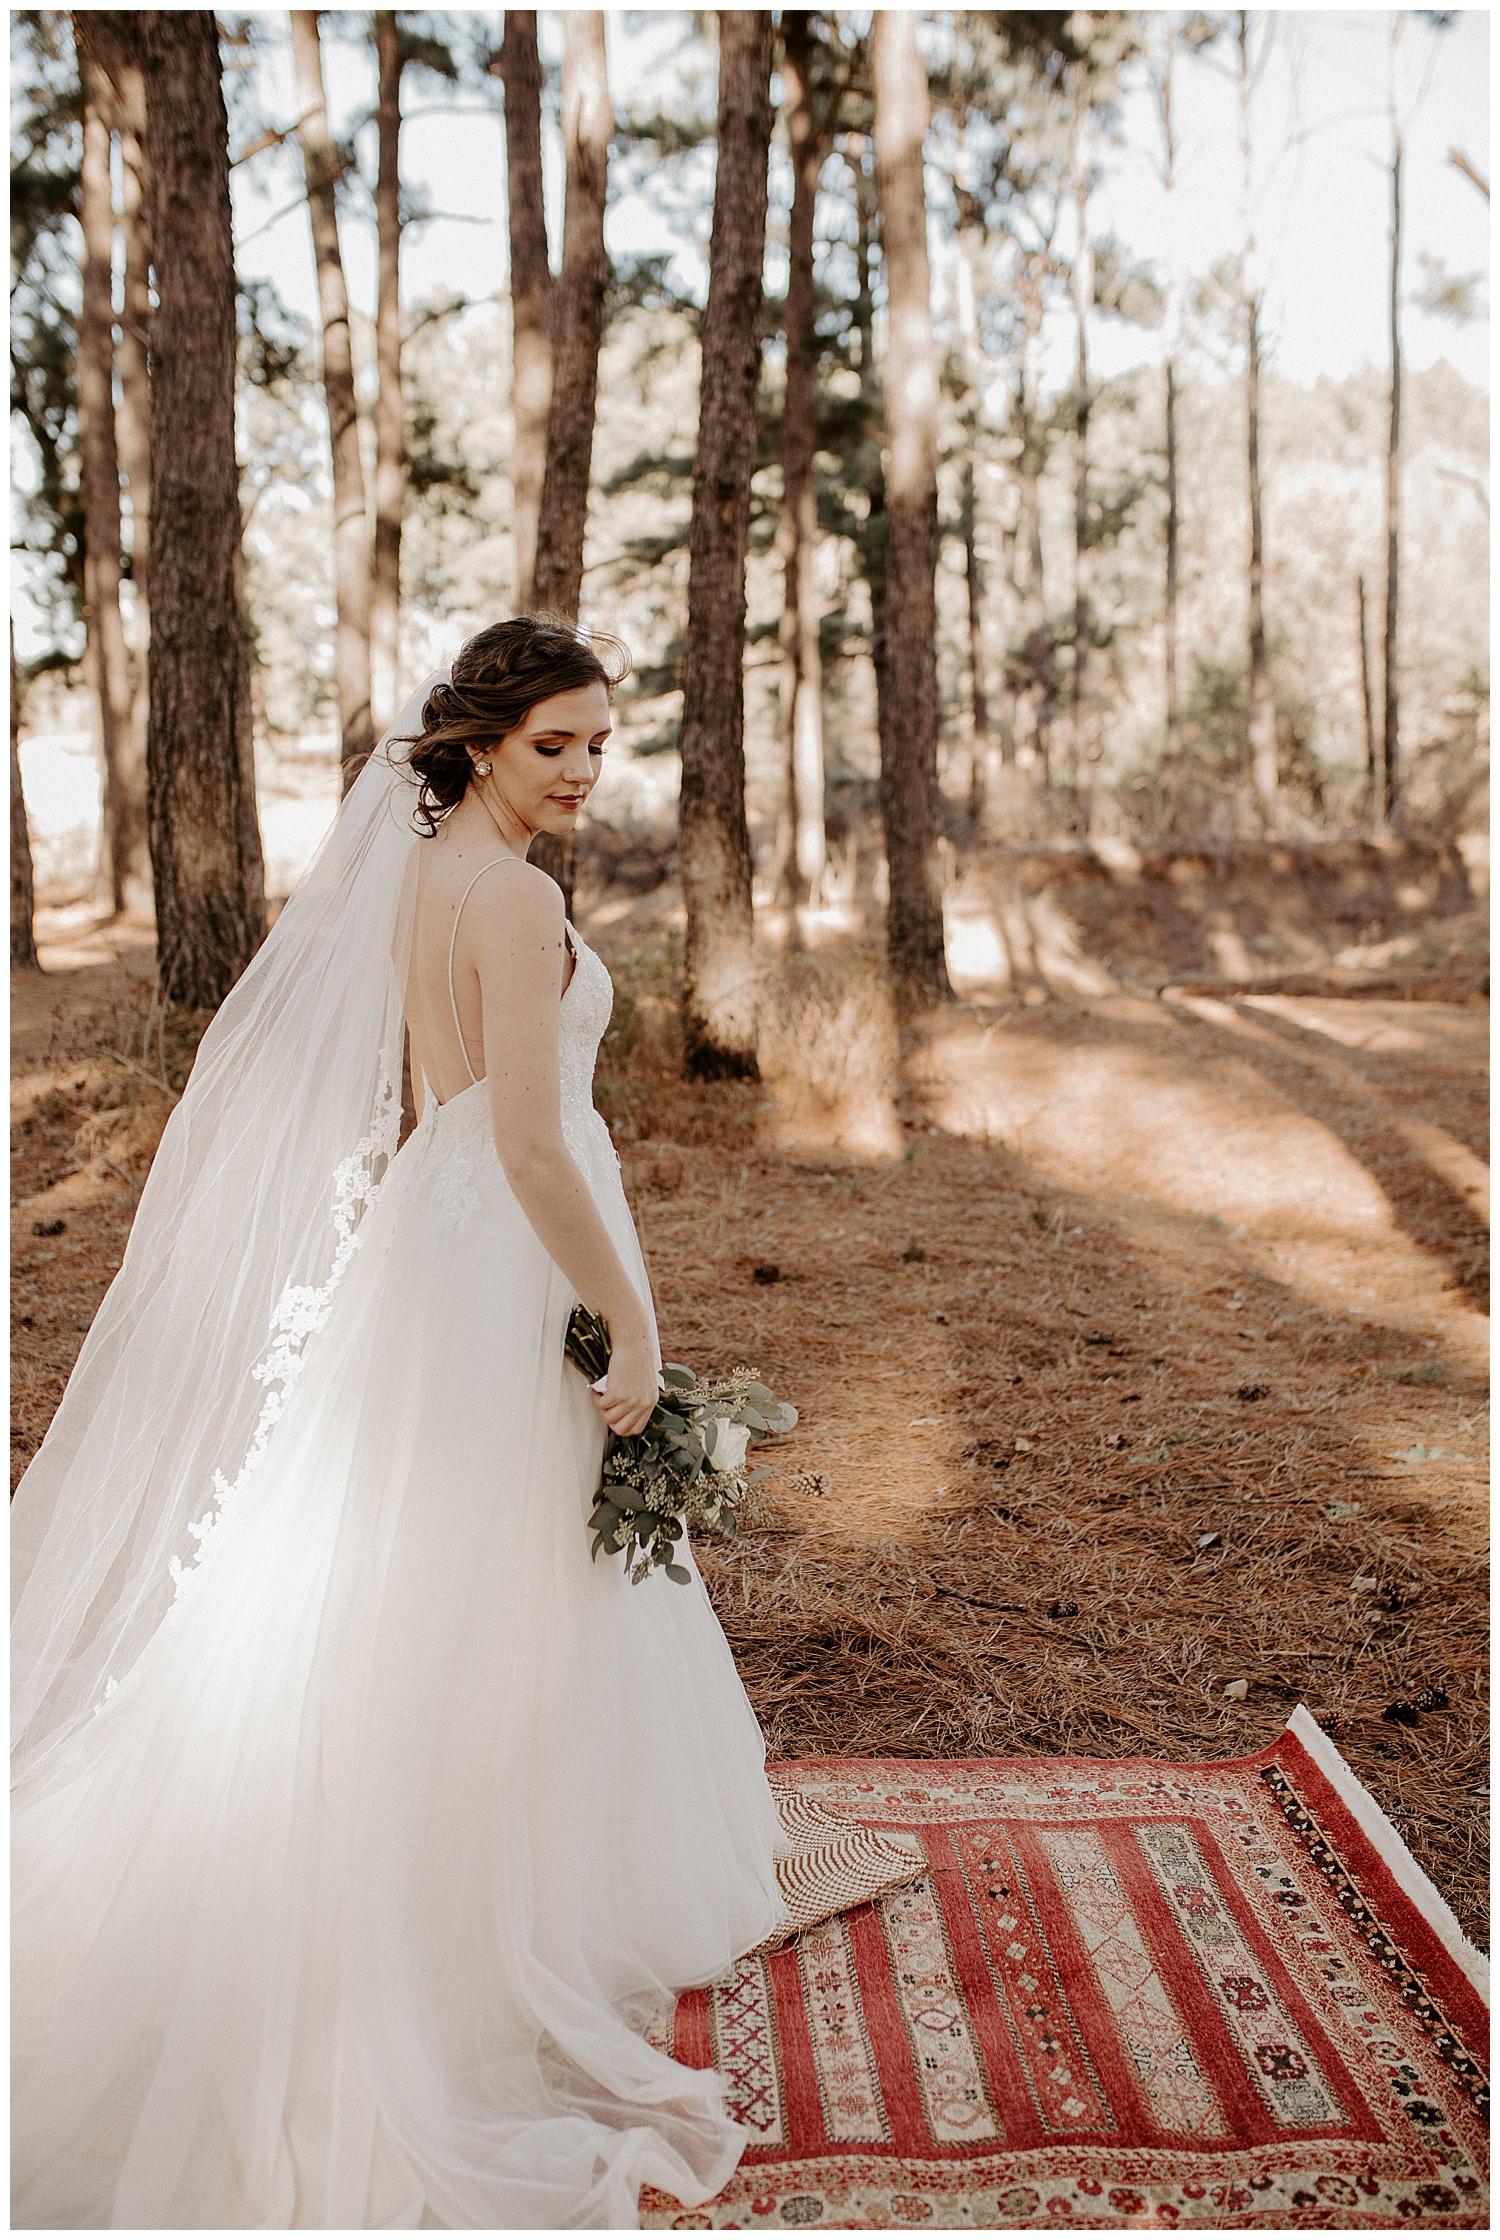 Laken-Mackenzie-Photography-Cheyenne-Bridal-Session-Dallas-Fort-Worth-Wedding-Photographer13.jpg